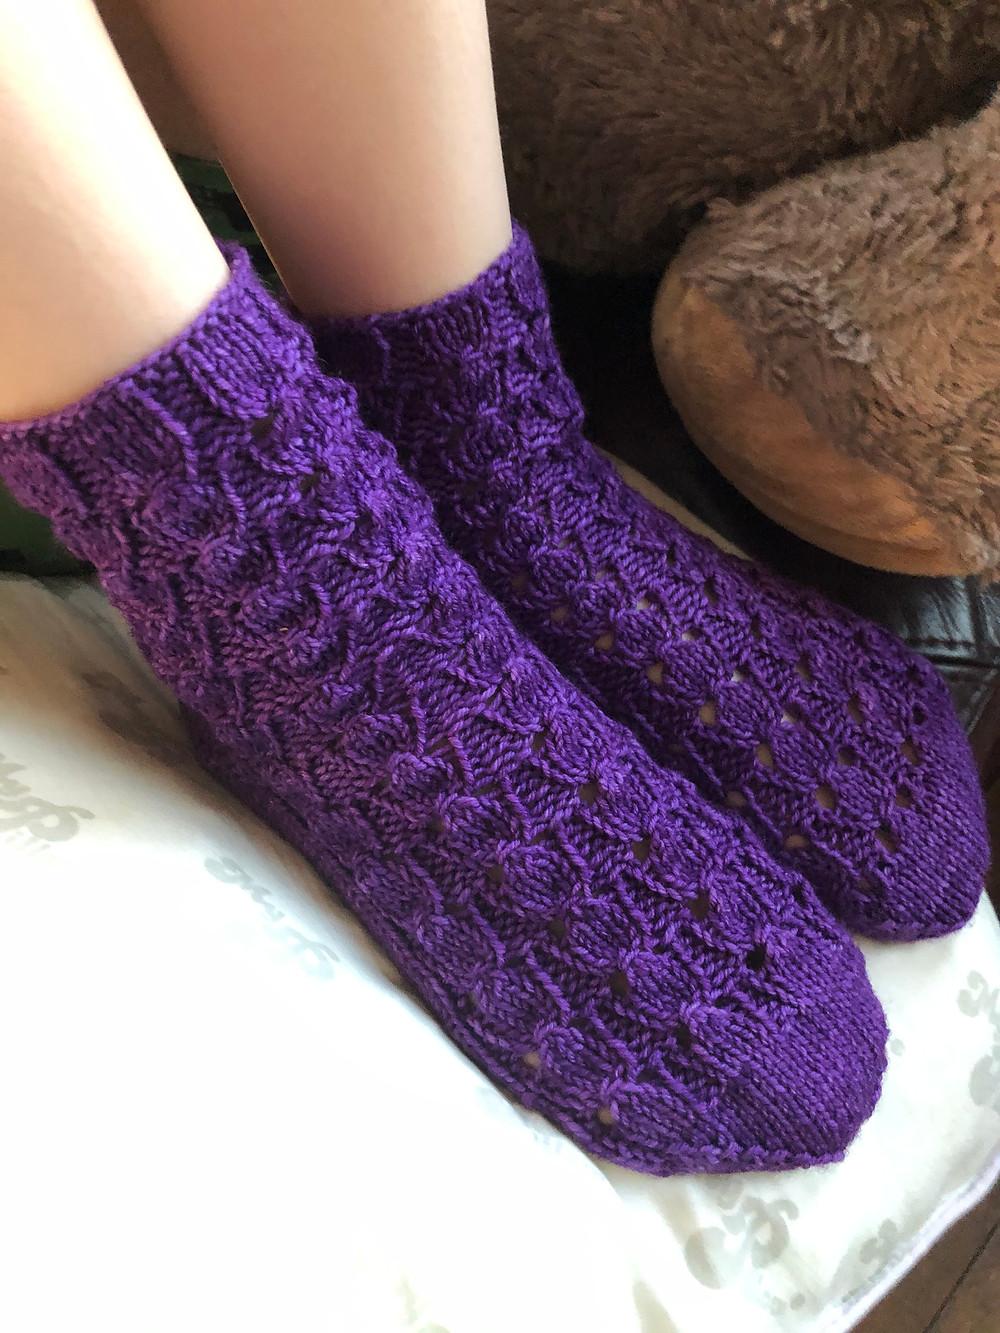 Tales of Childhood Shawl Lace and Mosaic Colorwork Knitting Pattern